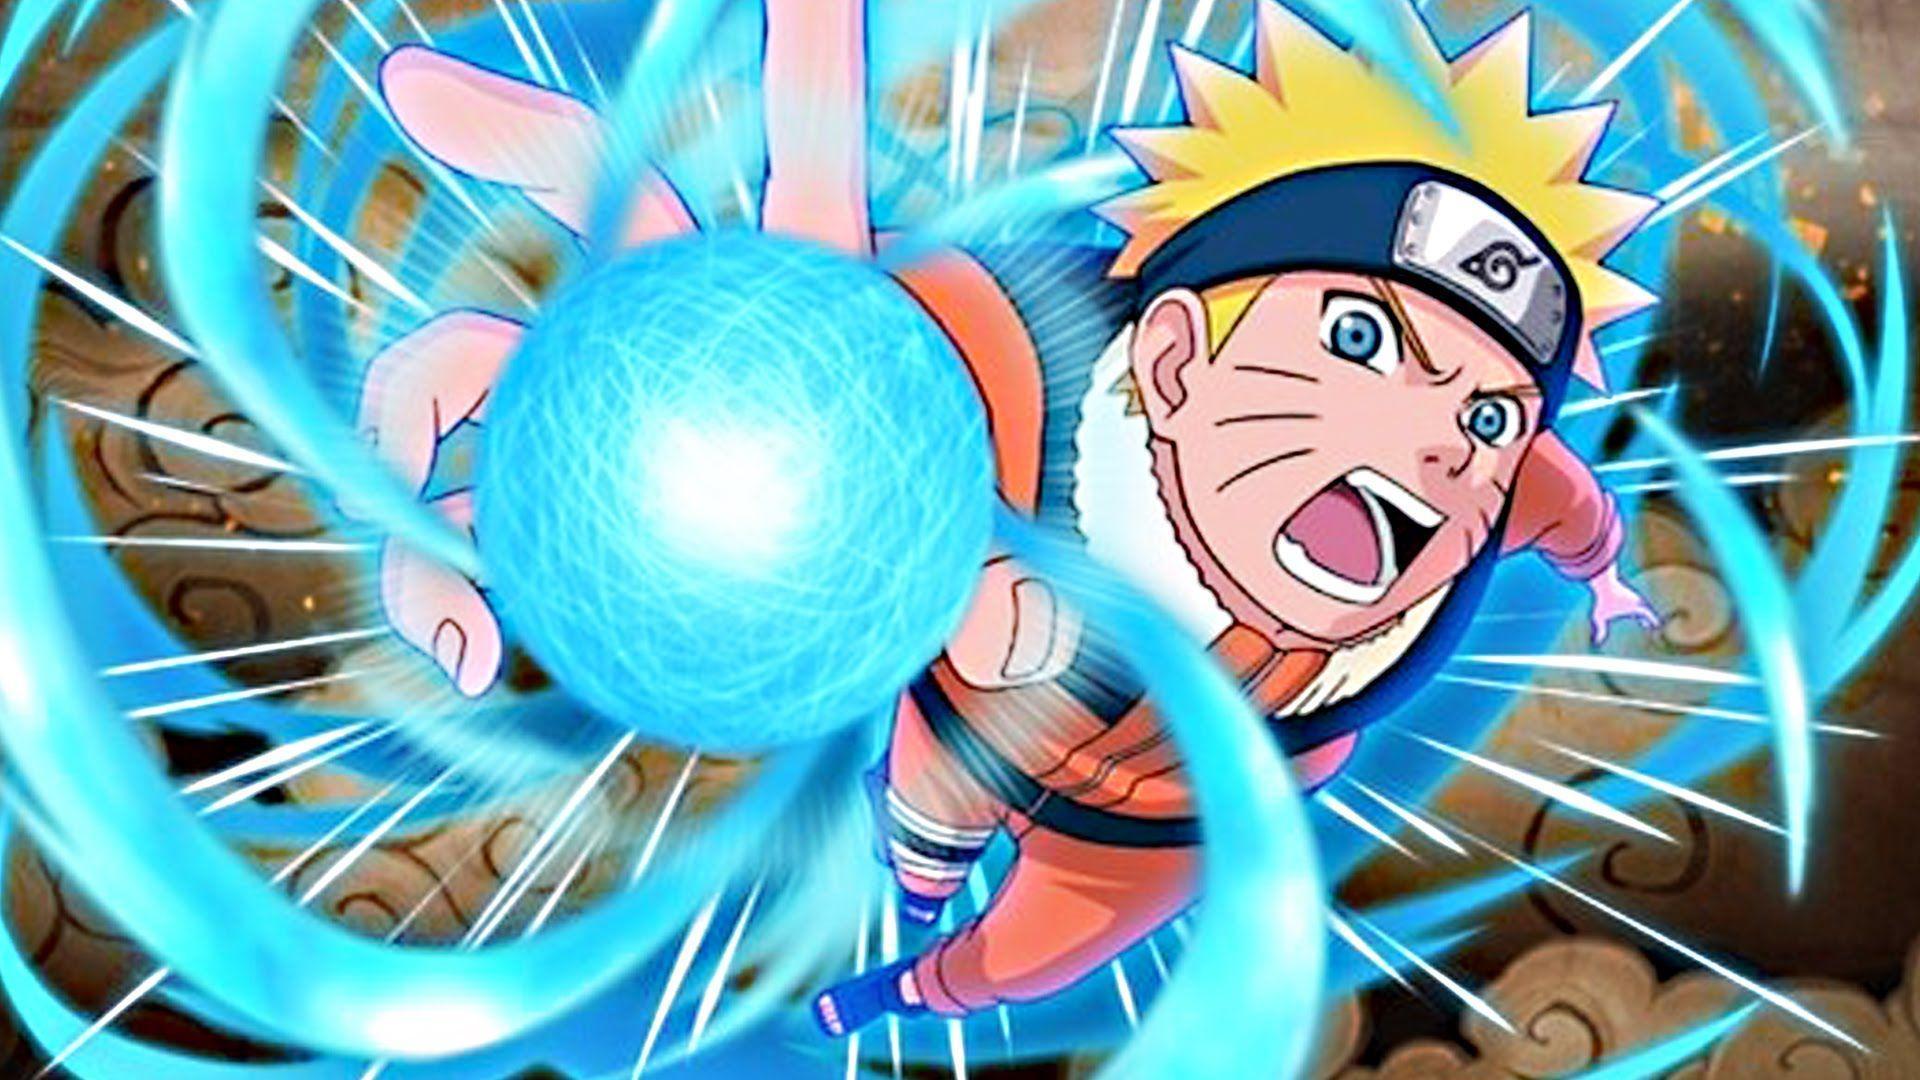 Naruto Rasengan Wallpapers Top Free Naruto Rasengan Backgrounds